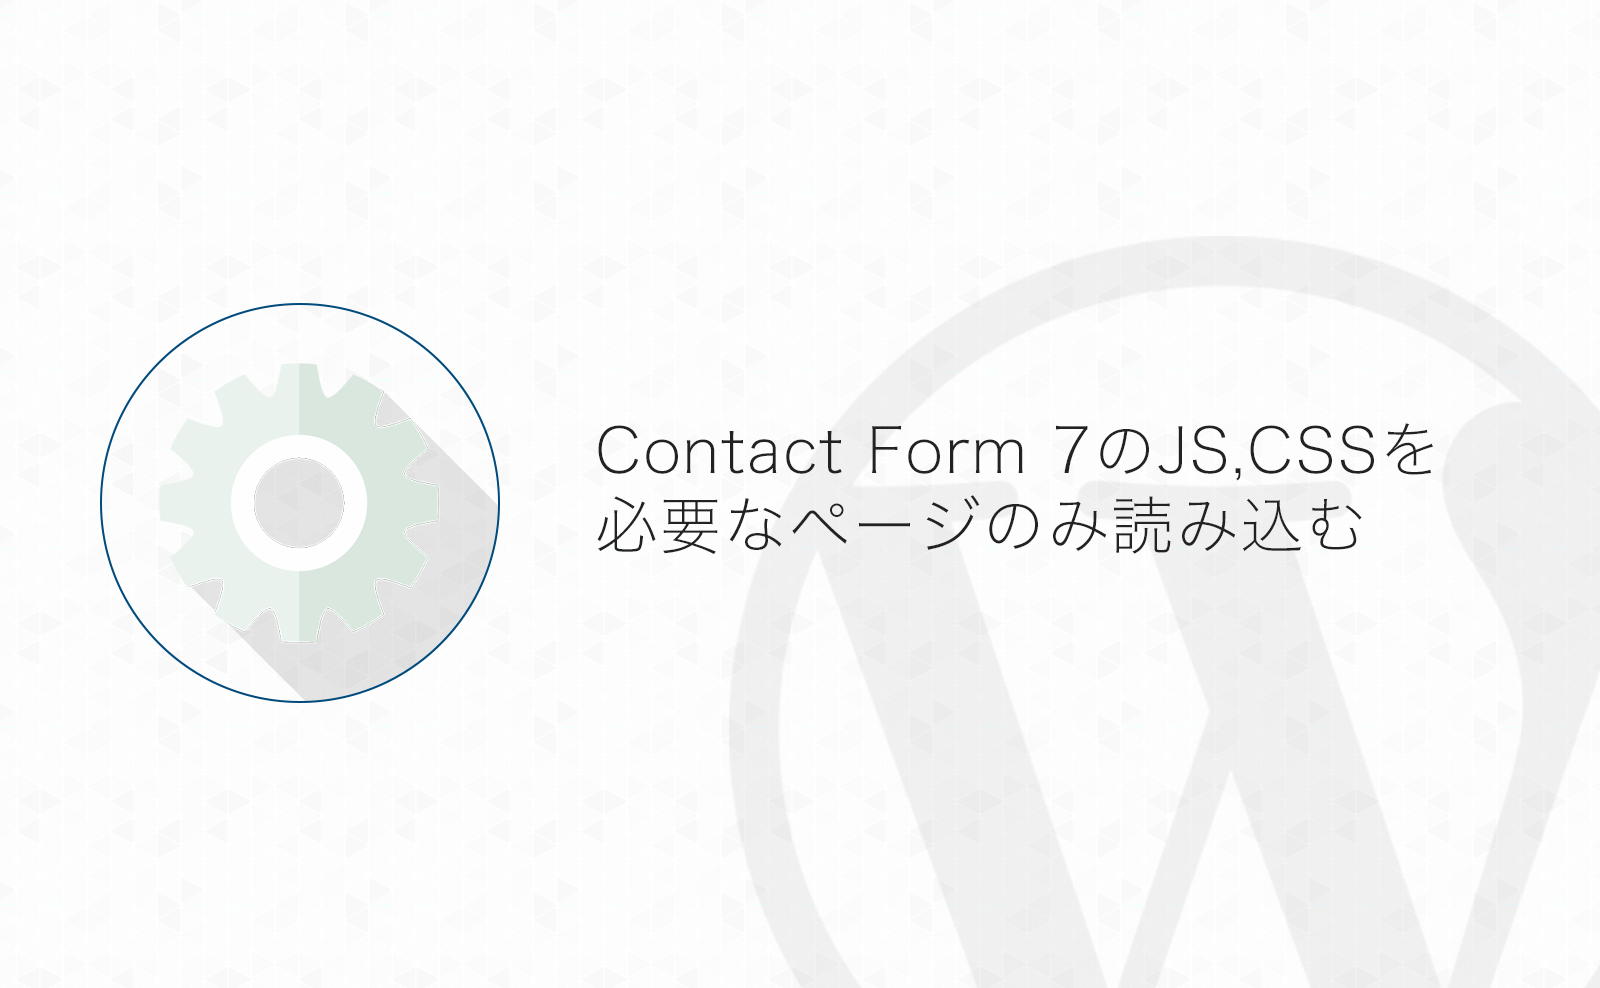 【WordPress】Contact Form 7のJavaScriptとCSSを削除、必要なページのみ読み込む方法